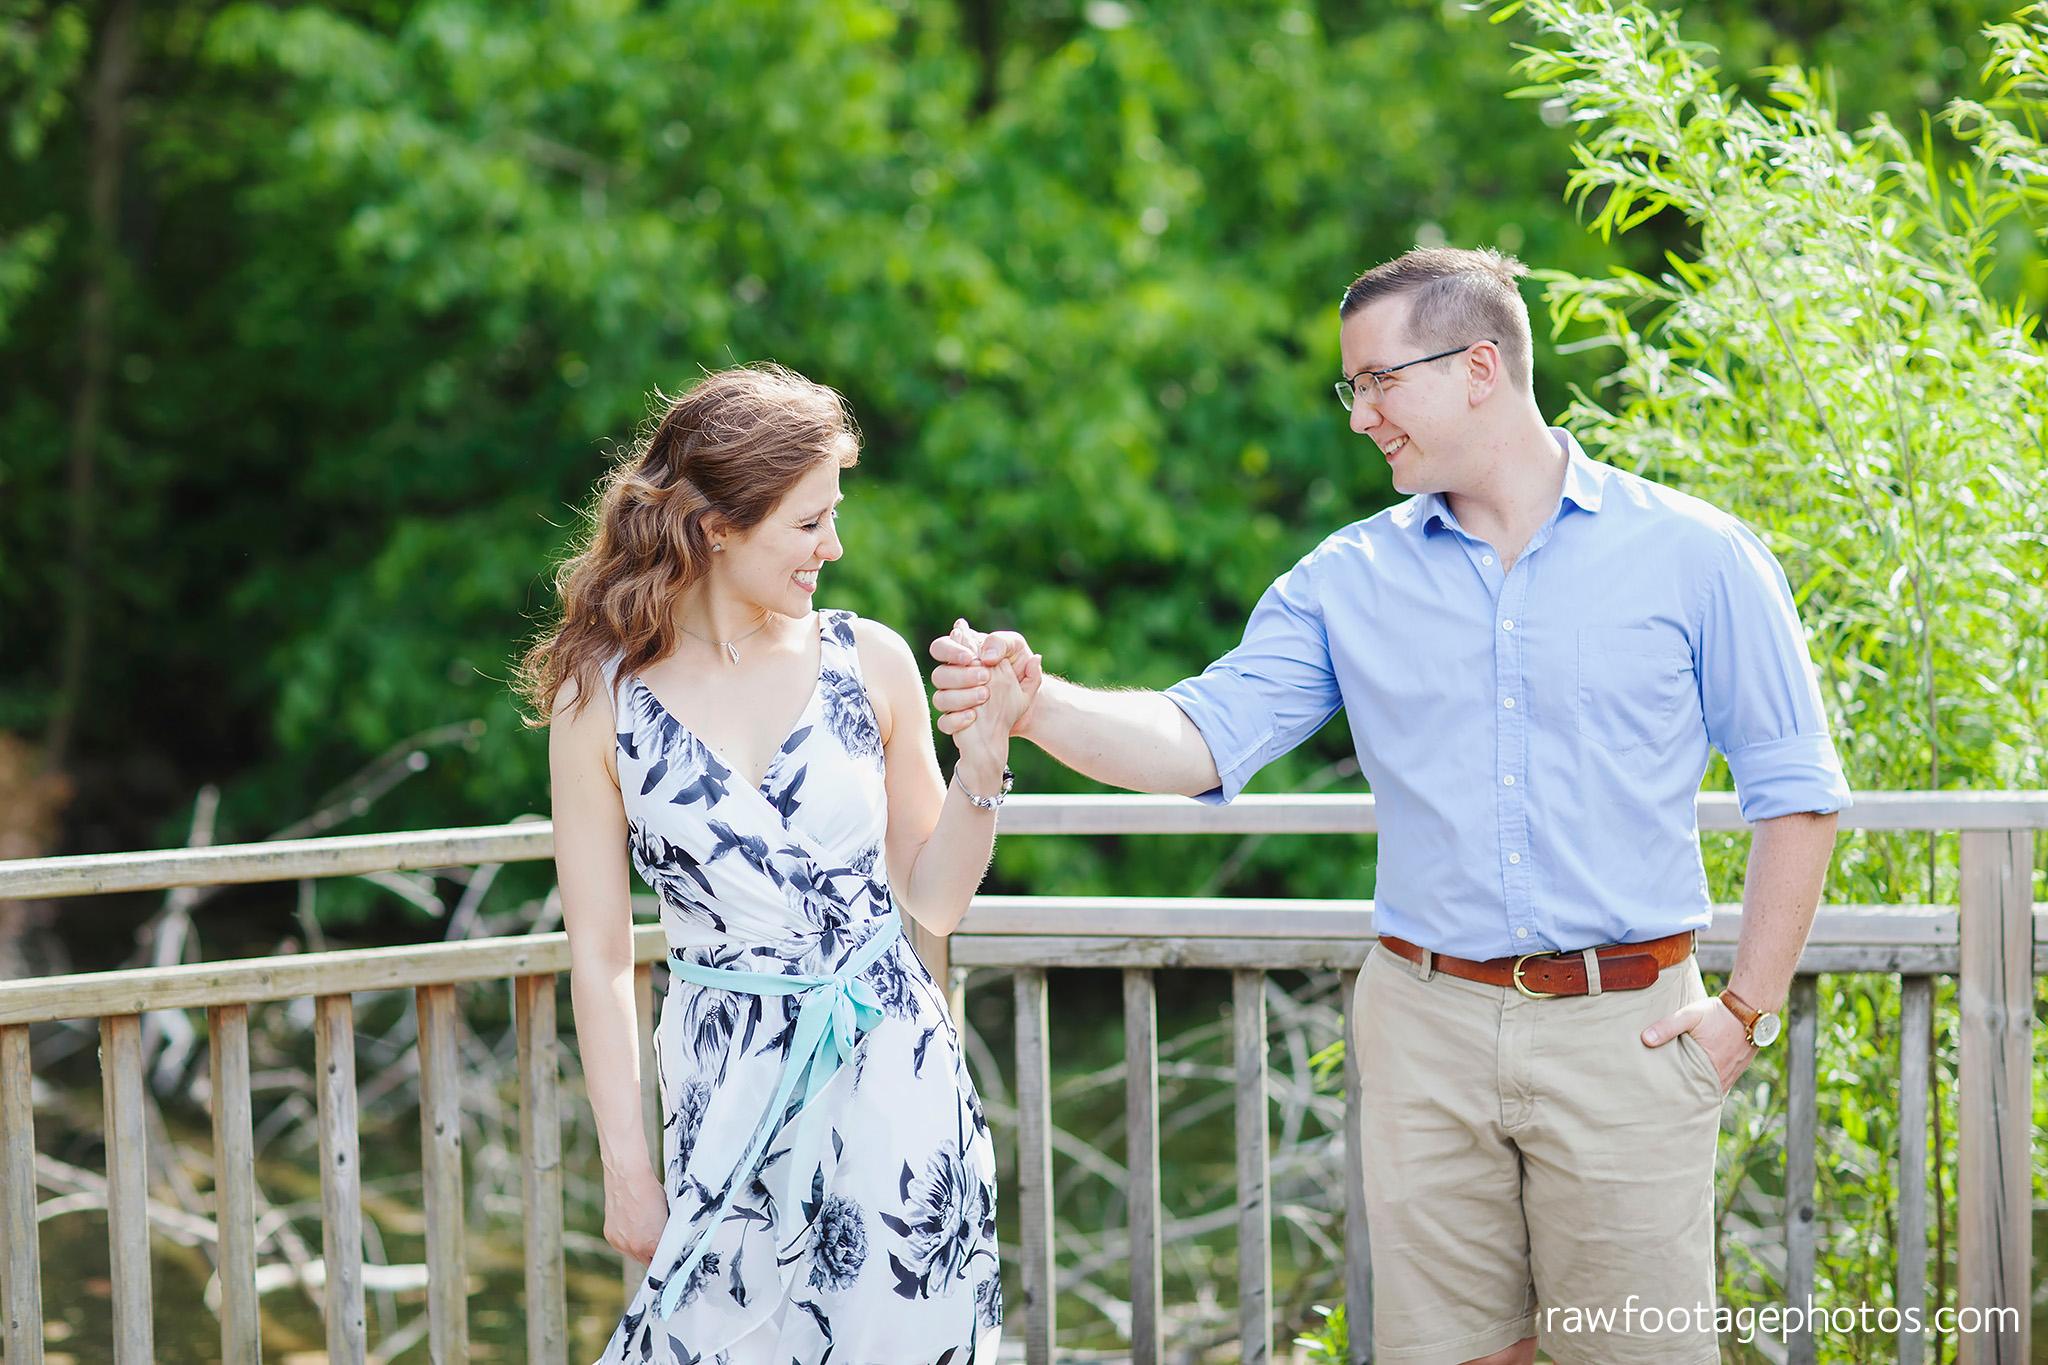 london_ontario_wedding_photographer-storybook_gardens_engagement_session-raw_footage_photography009.jpg